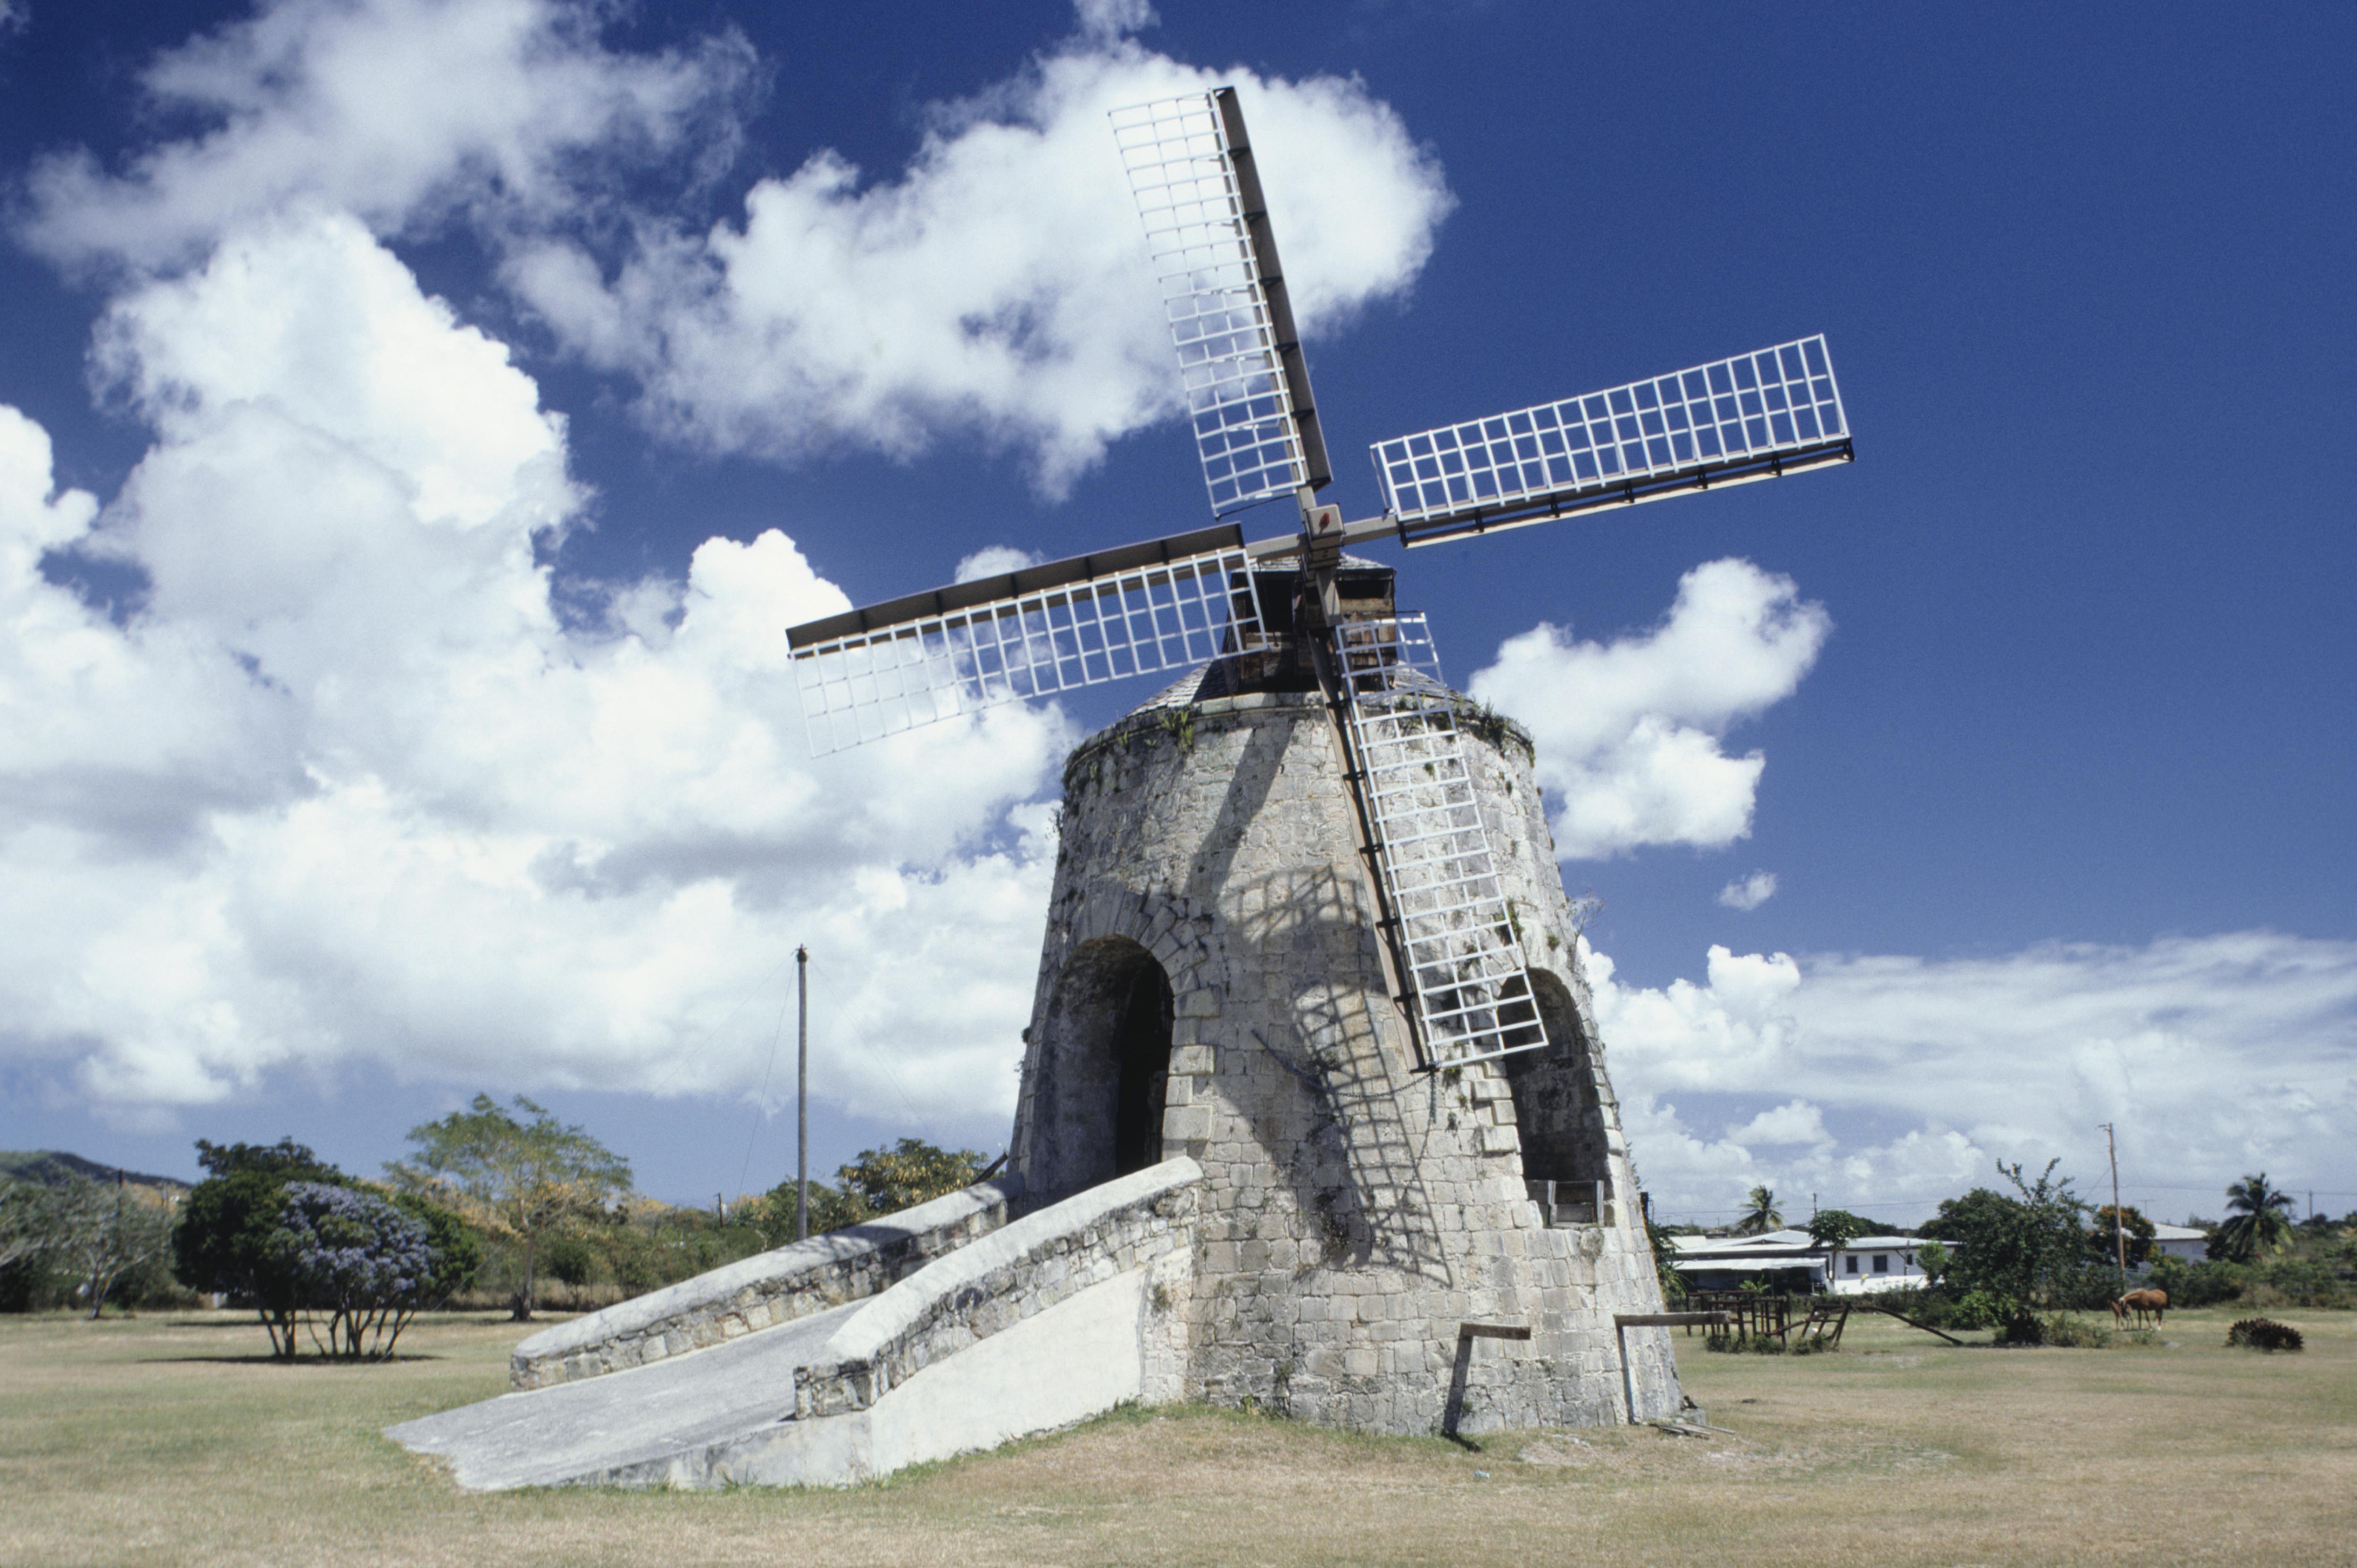 Sugar cane ruin, Whim Greathouse, US Virgin Islands